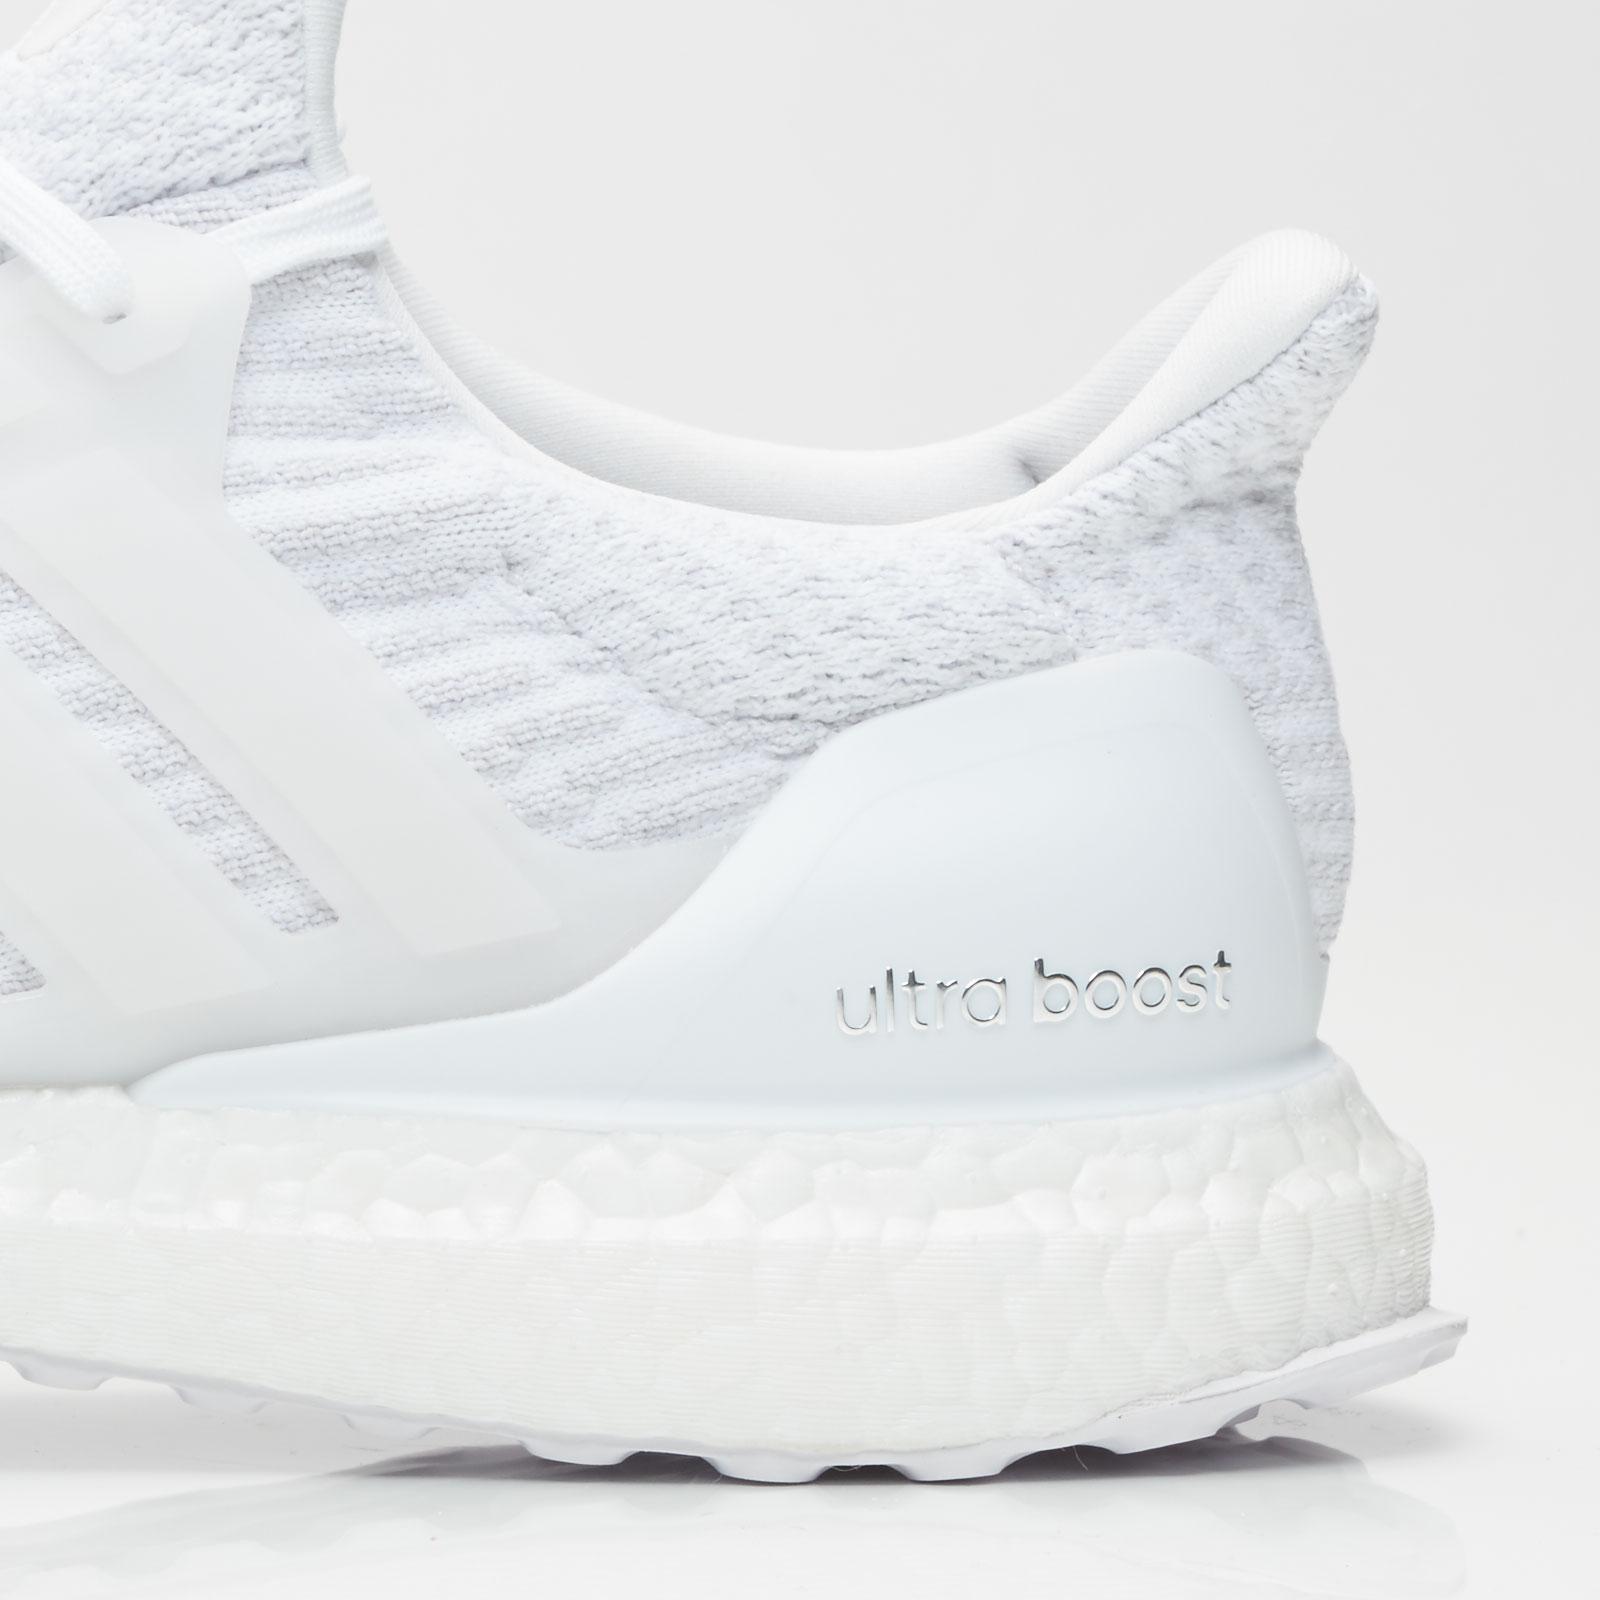 be6ba50ada2fd adidas UltraBOOST - Ba8841 - Sneakersnstuff